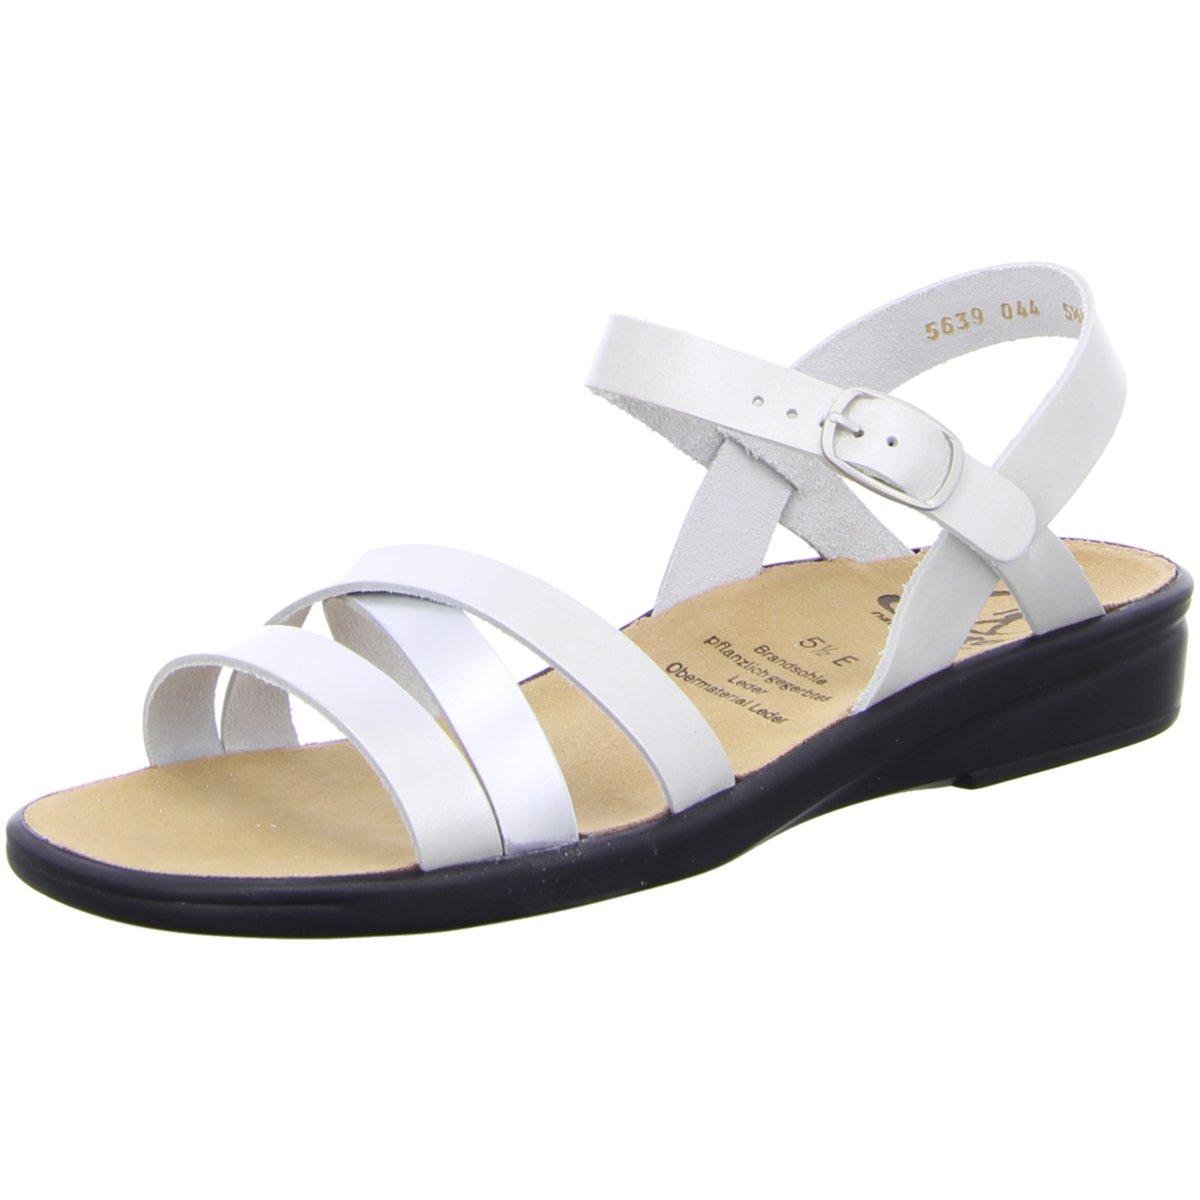 Ganter Damen Sandaletten Sonnica 20 2810-0476 weiß 24200